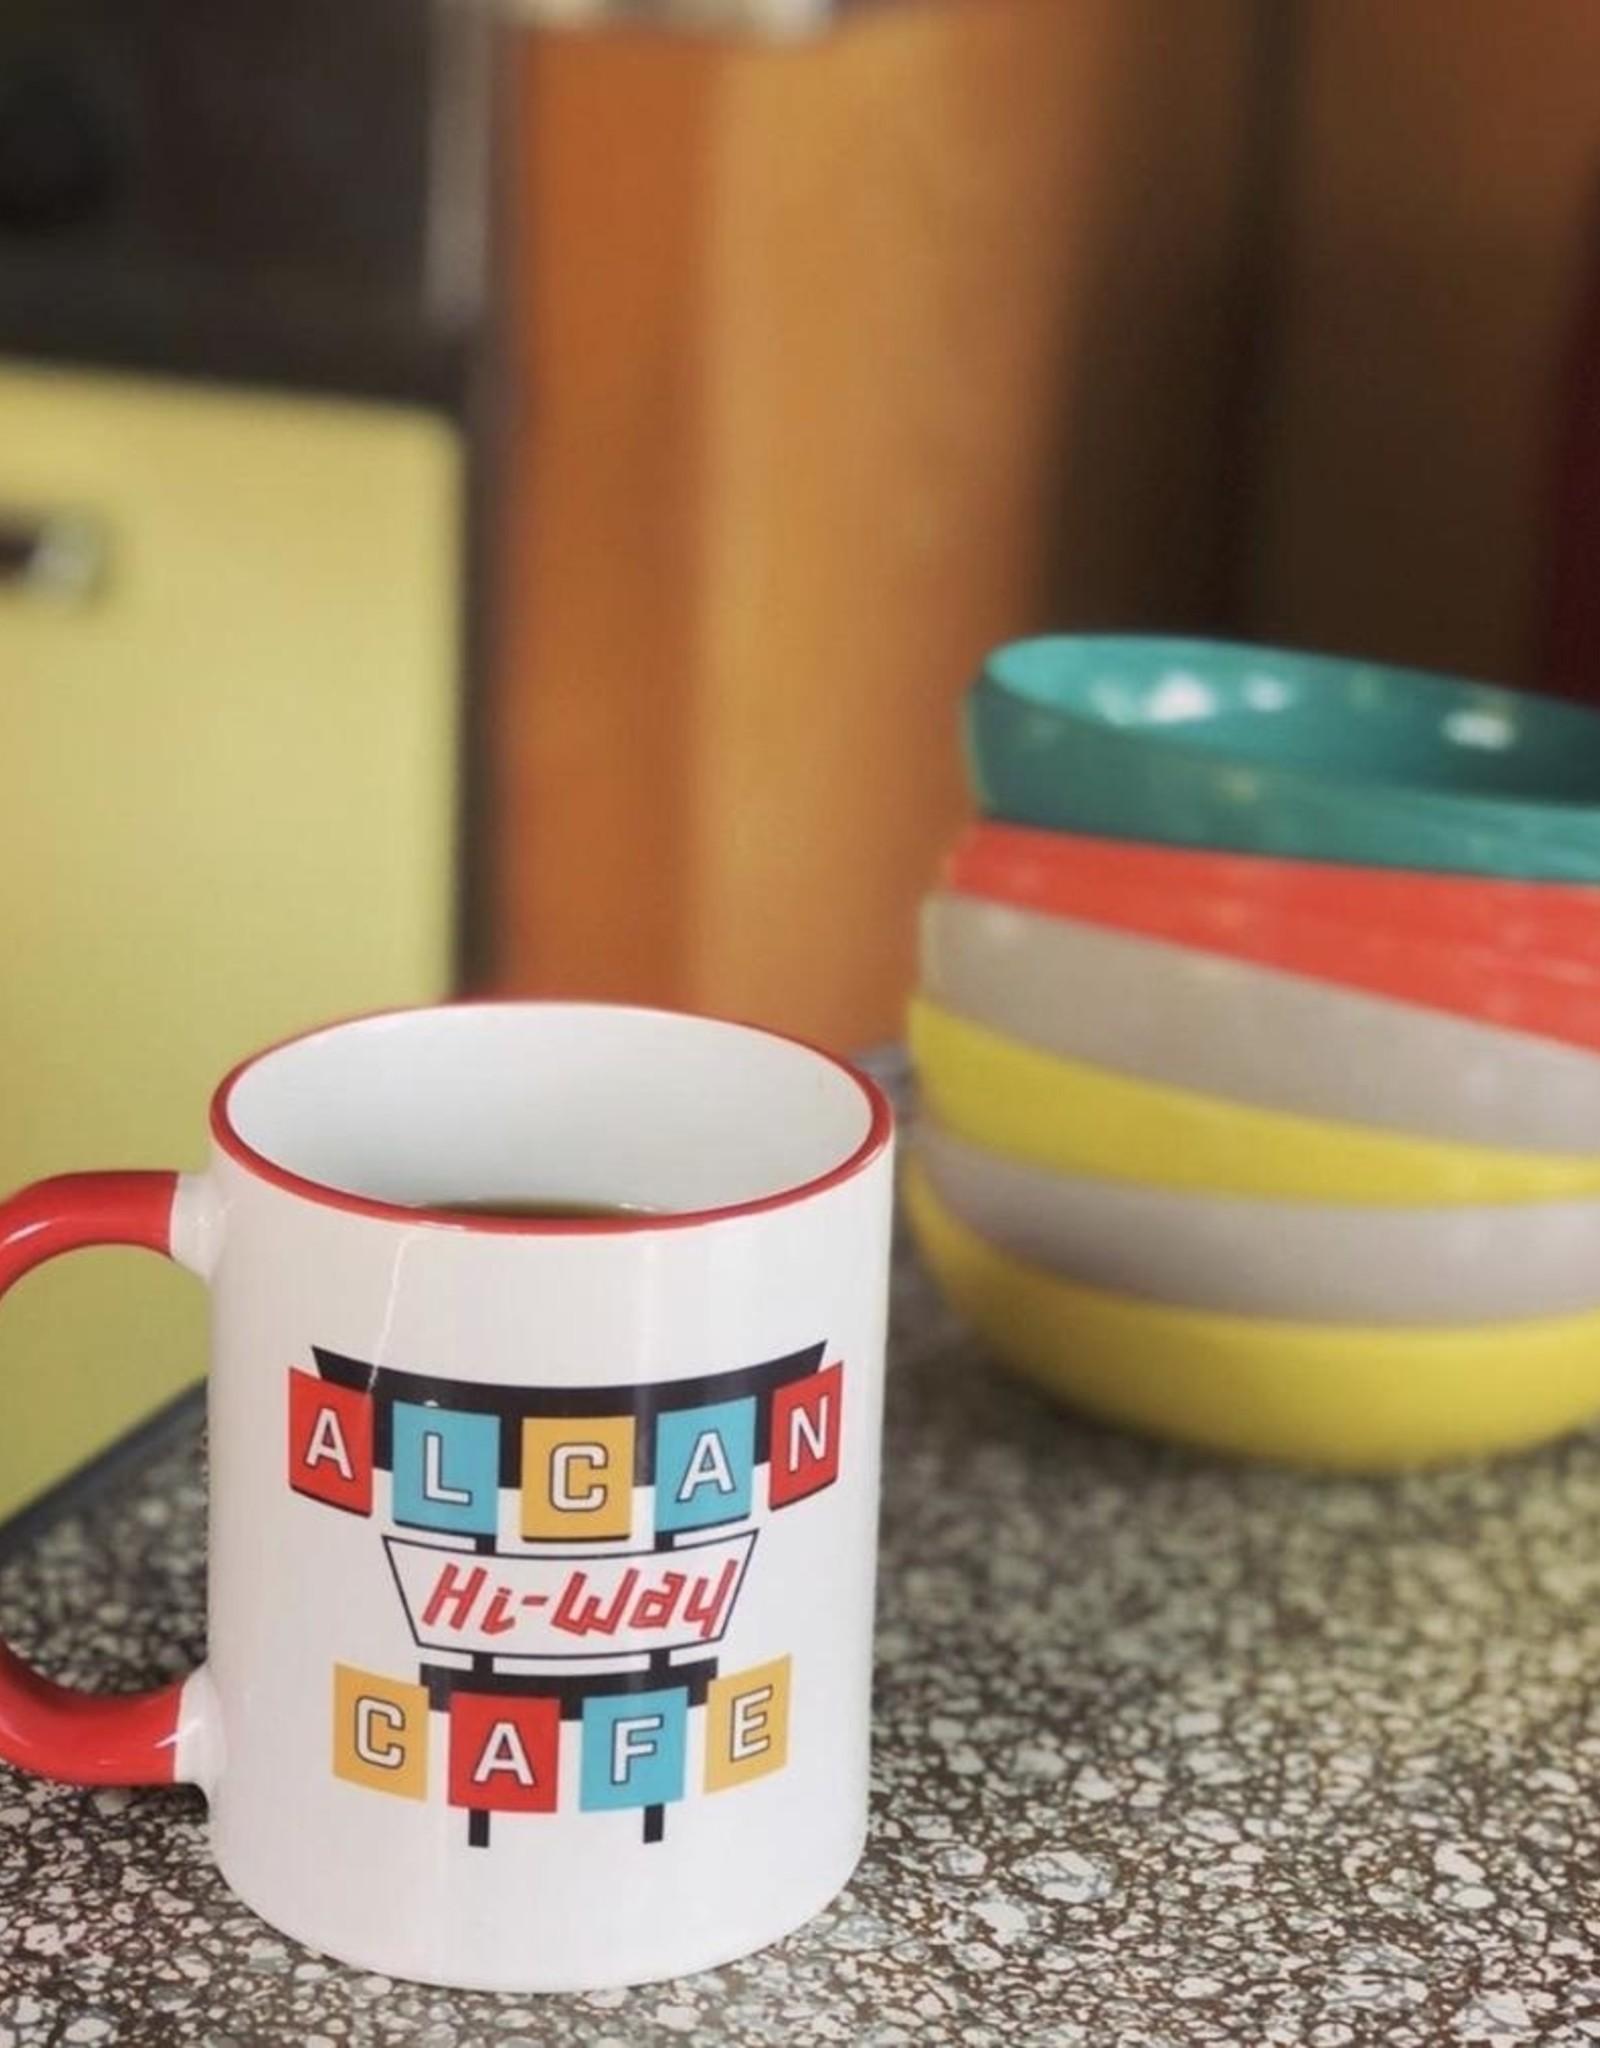 The Collective Good The Collective Good Alcan Cafe Ceramic Mug